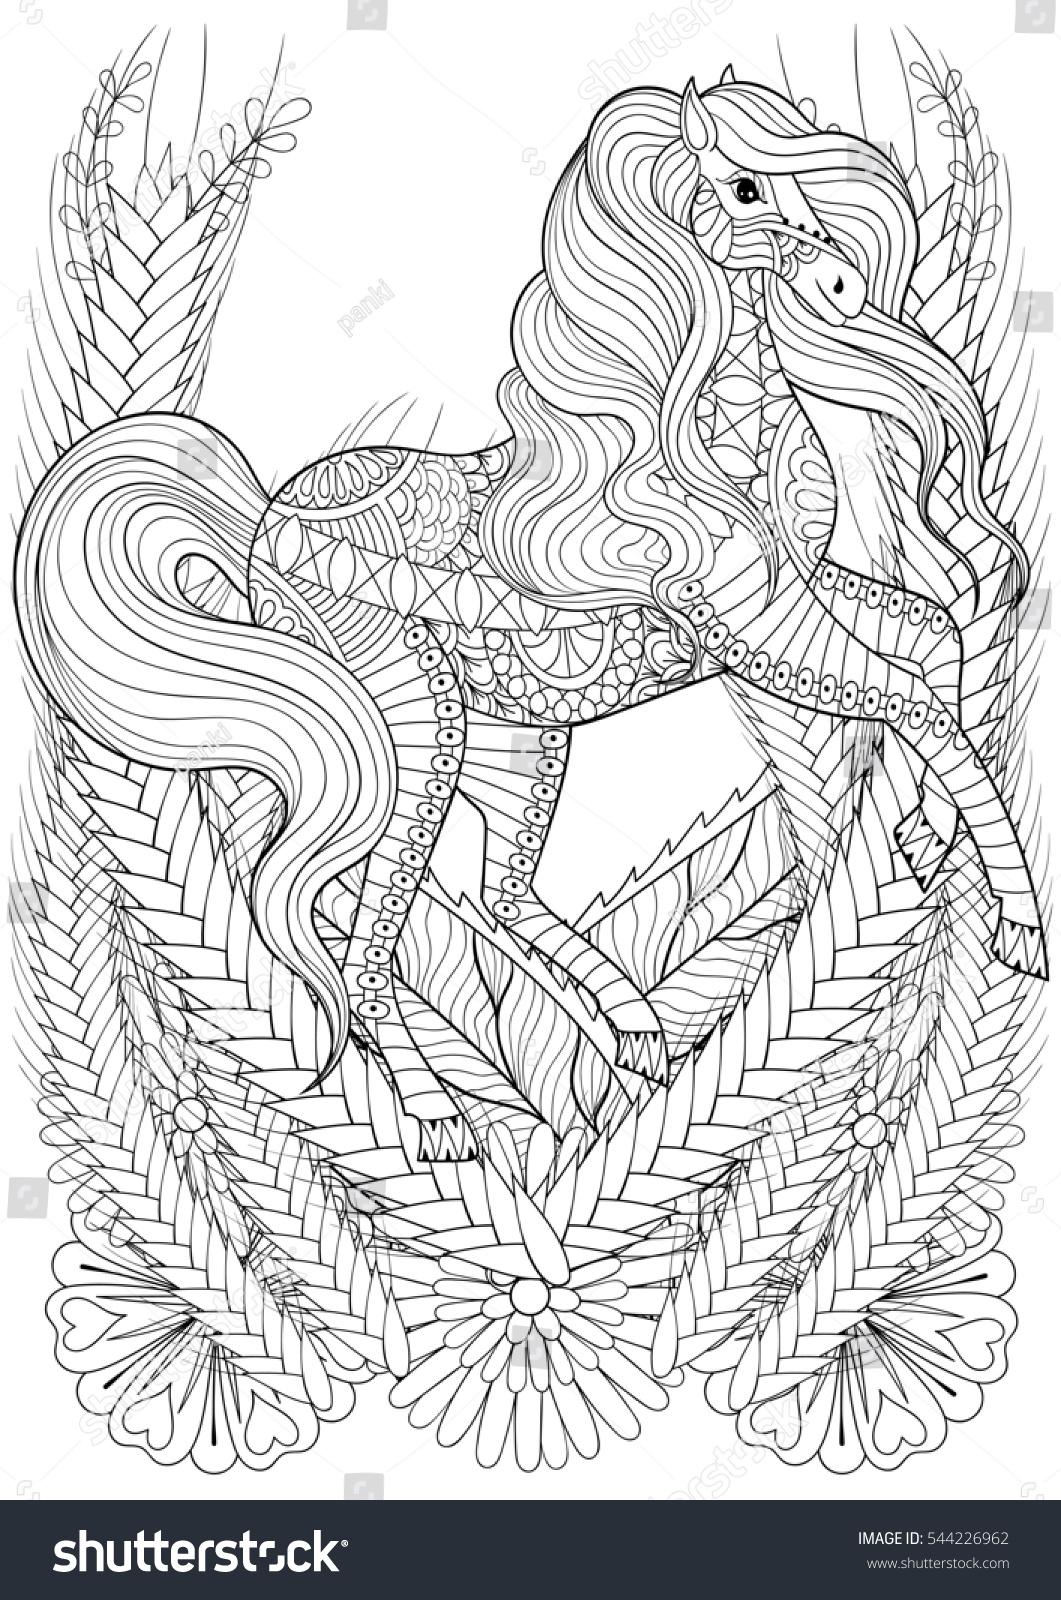 Jumping Horse Coloring Sheet - Horse Racing Coloring Book